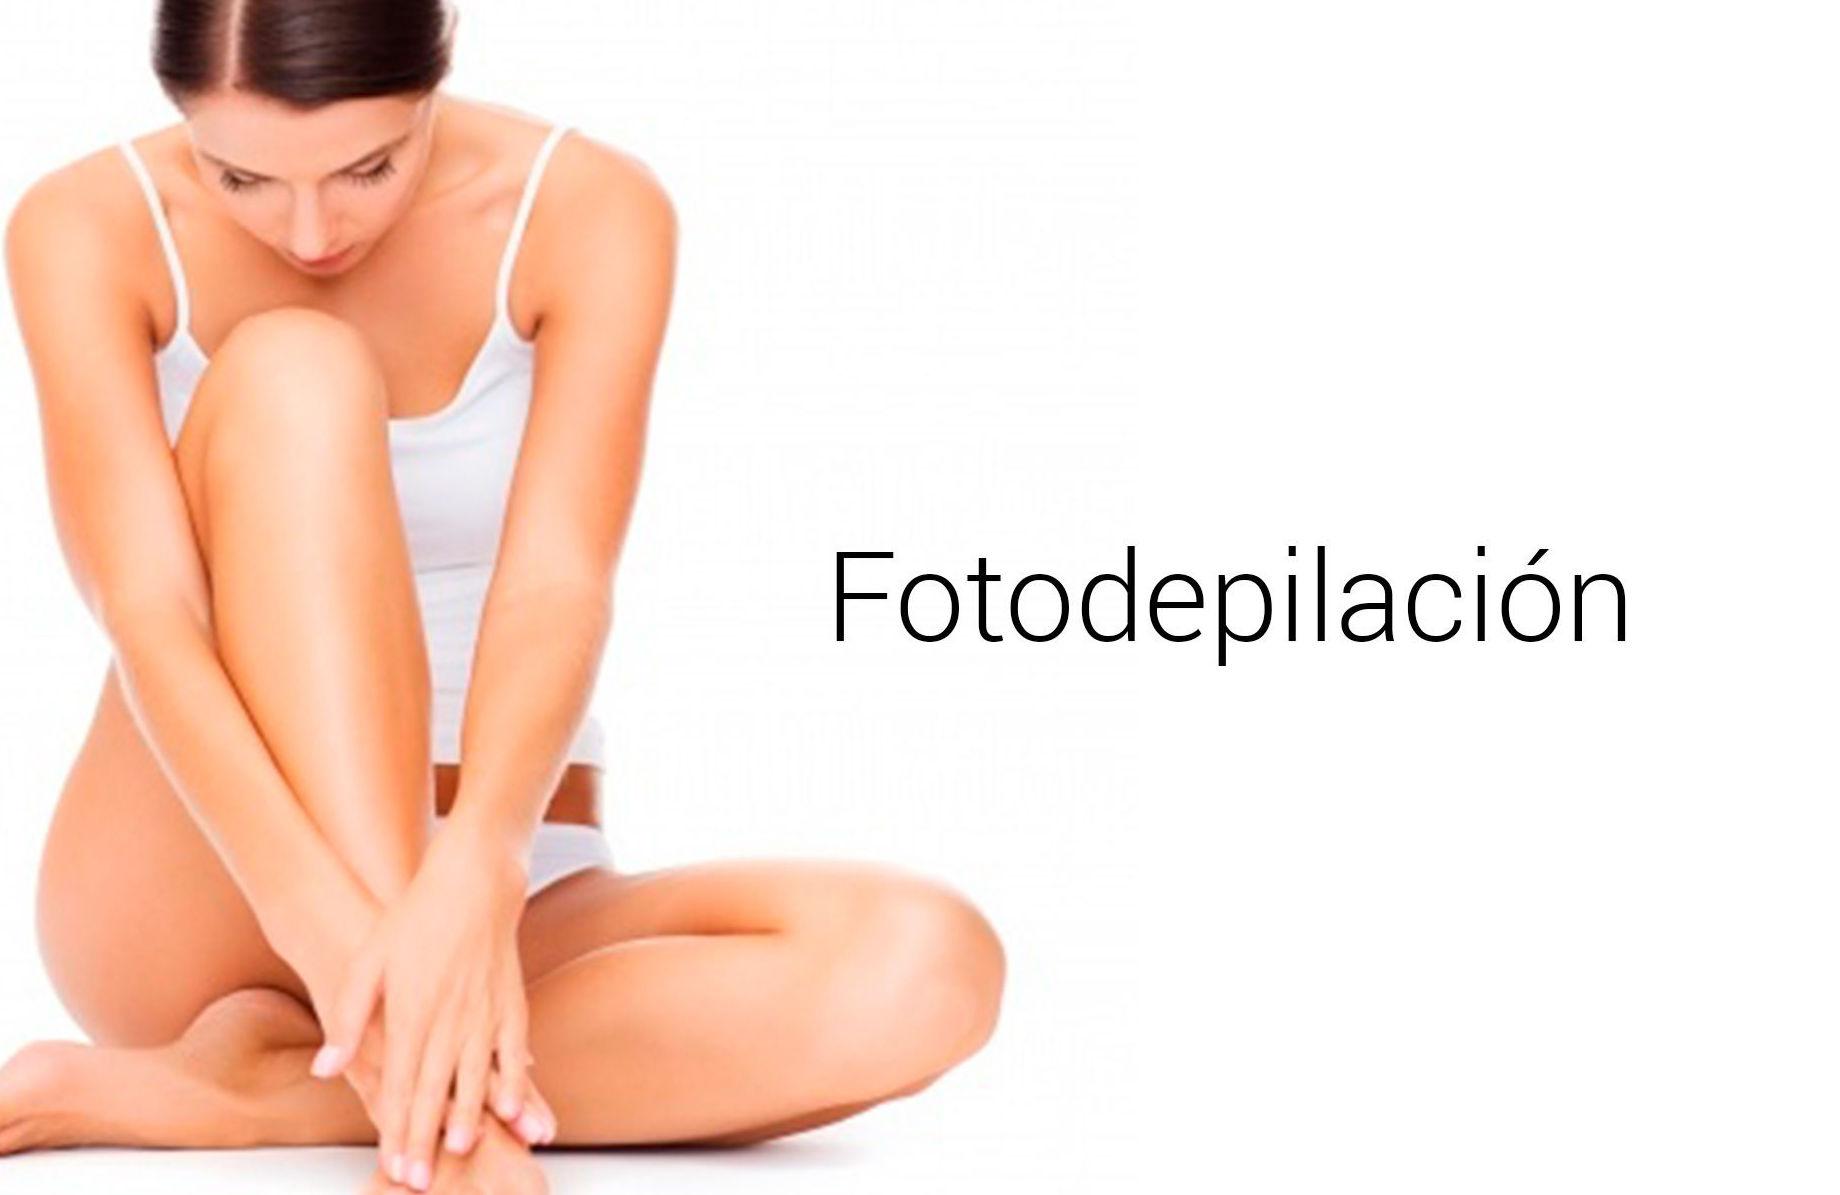 FOTODEPILACION - IPL